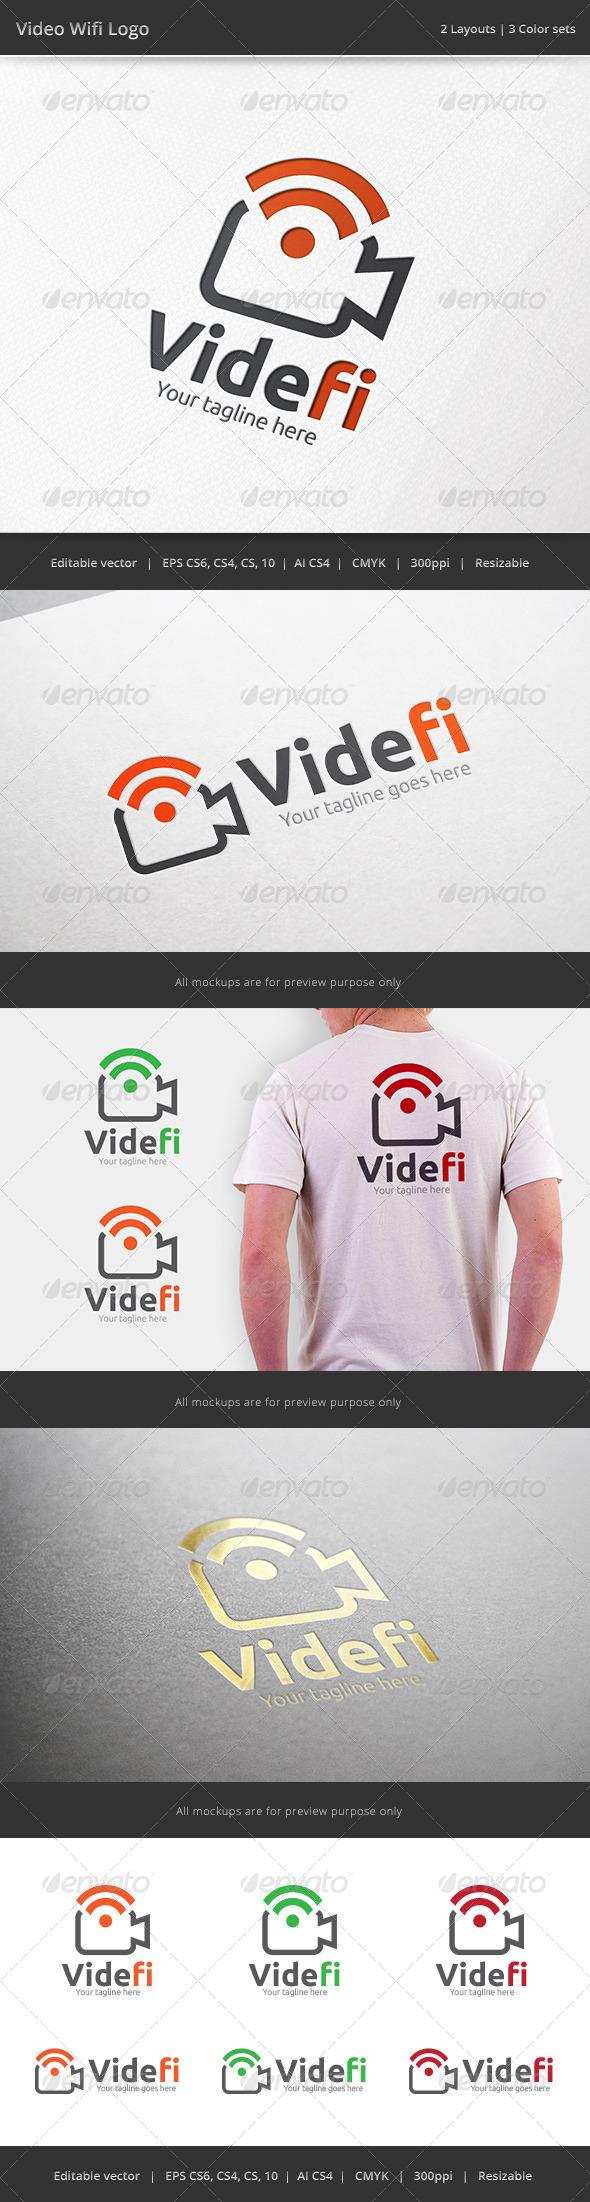 Video Wifi Camera Logo - Objects Logo Templates